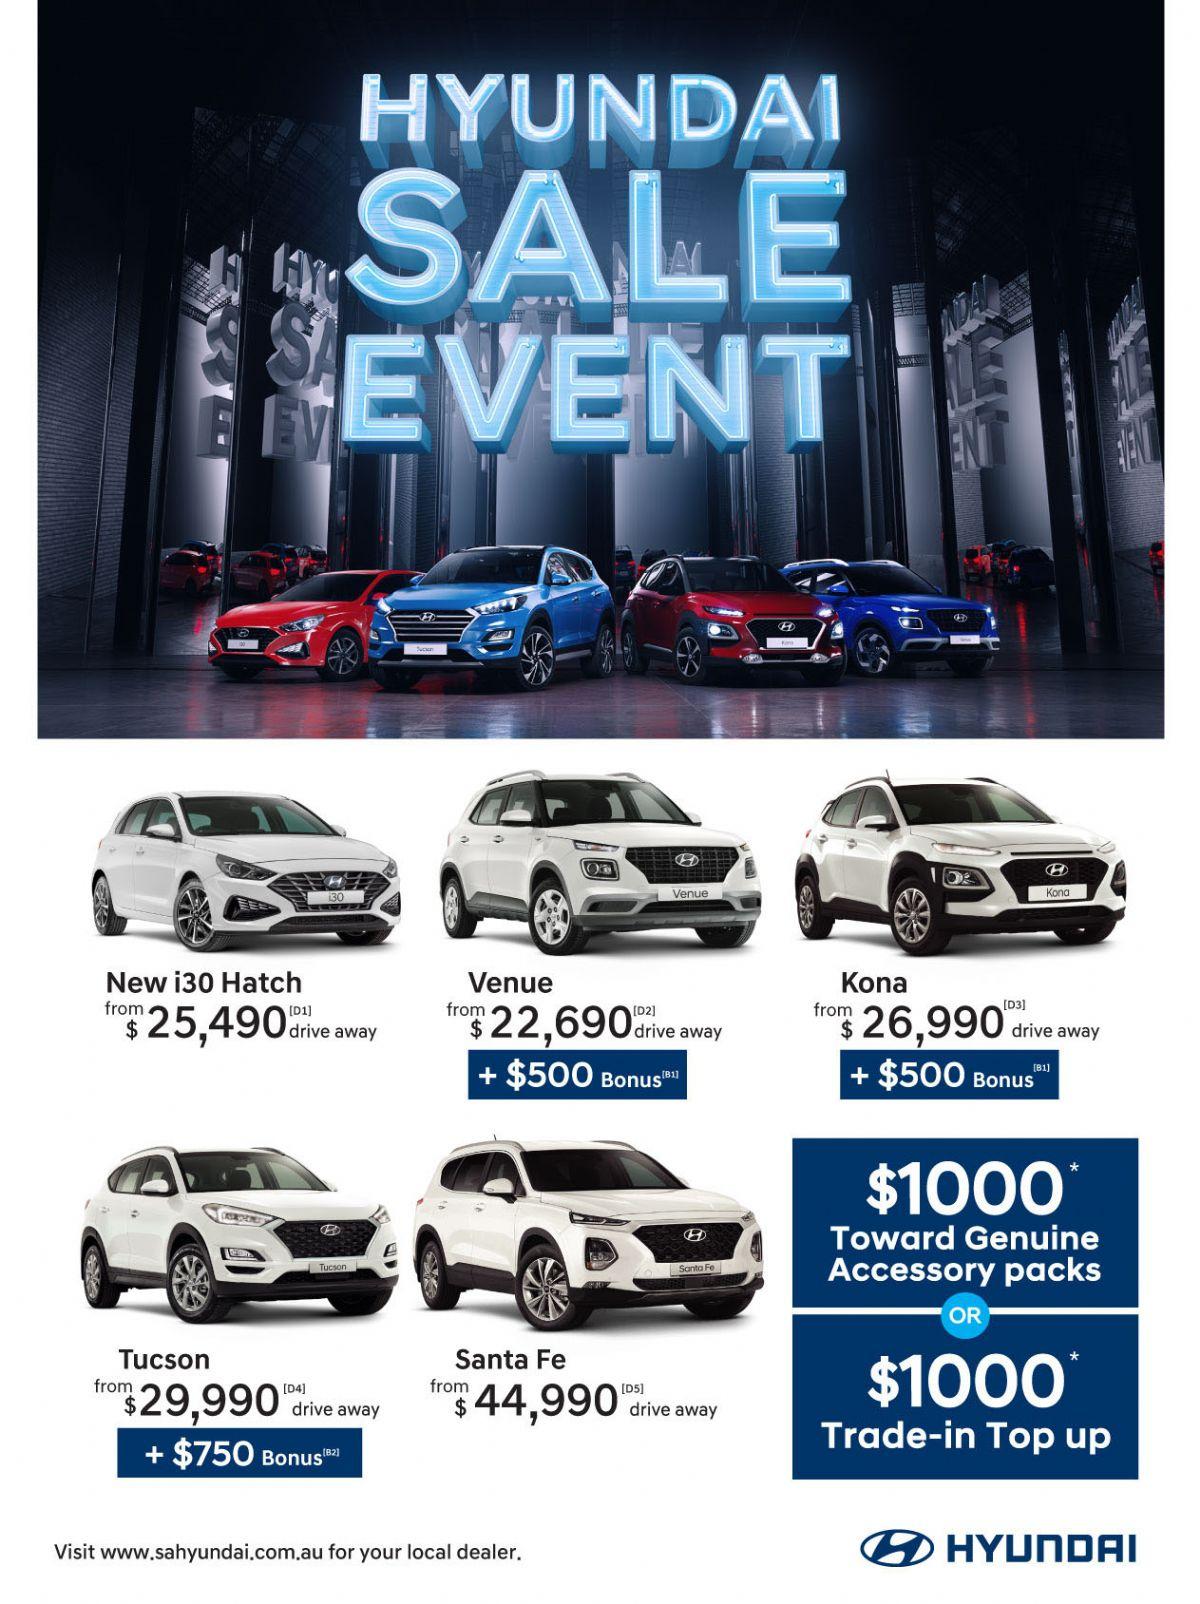 Rural Hyundai Dealer Campaign